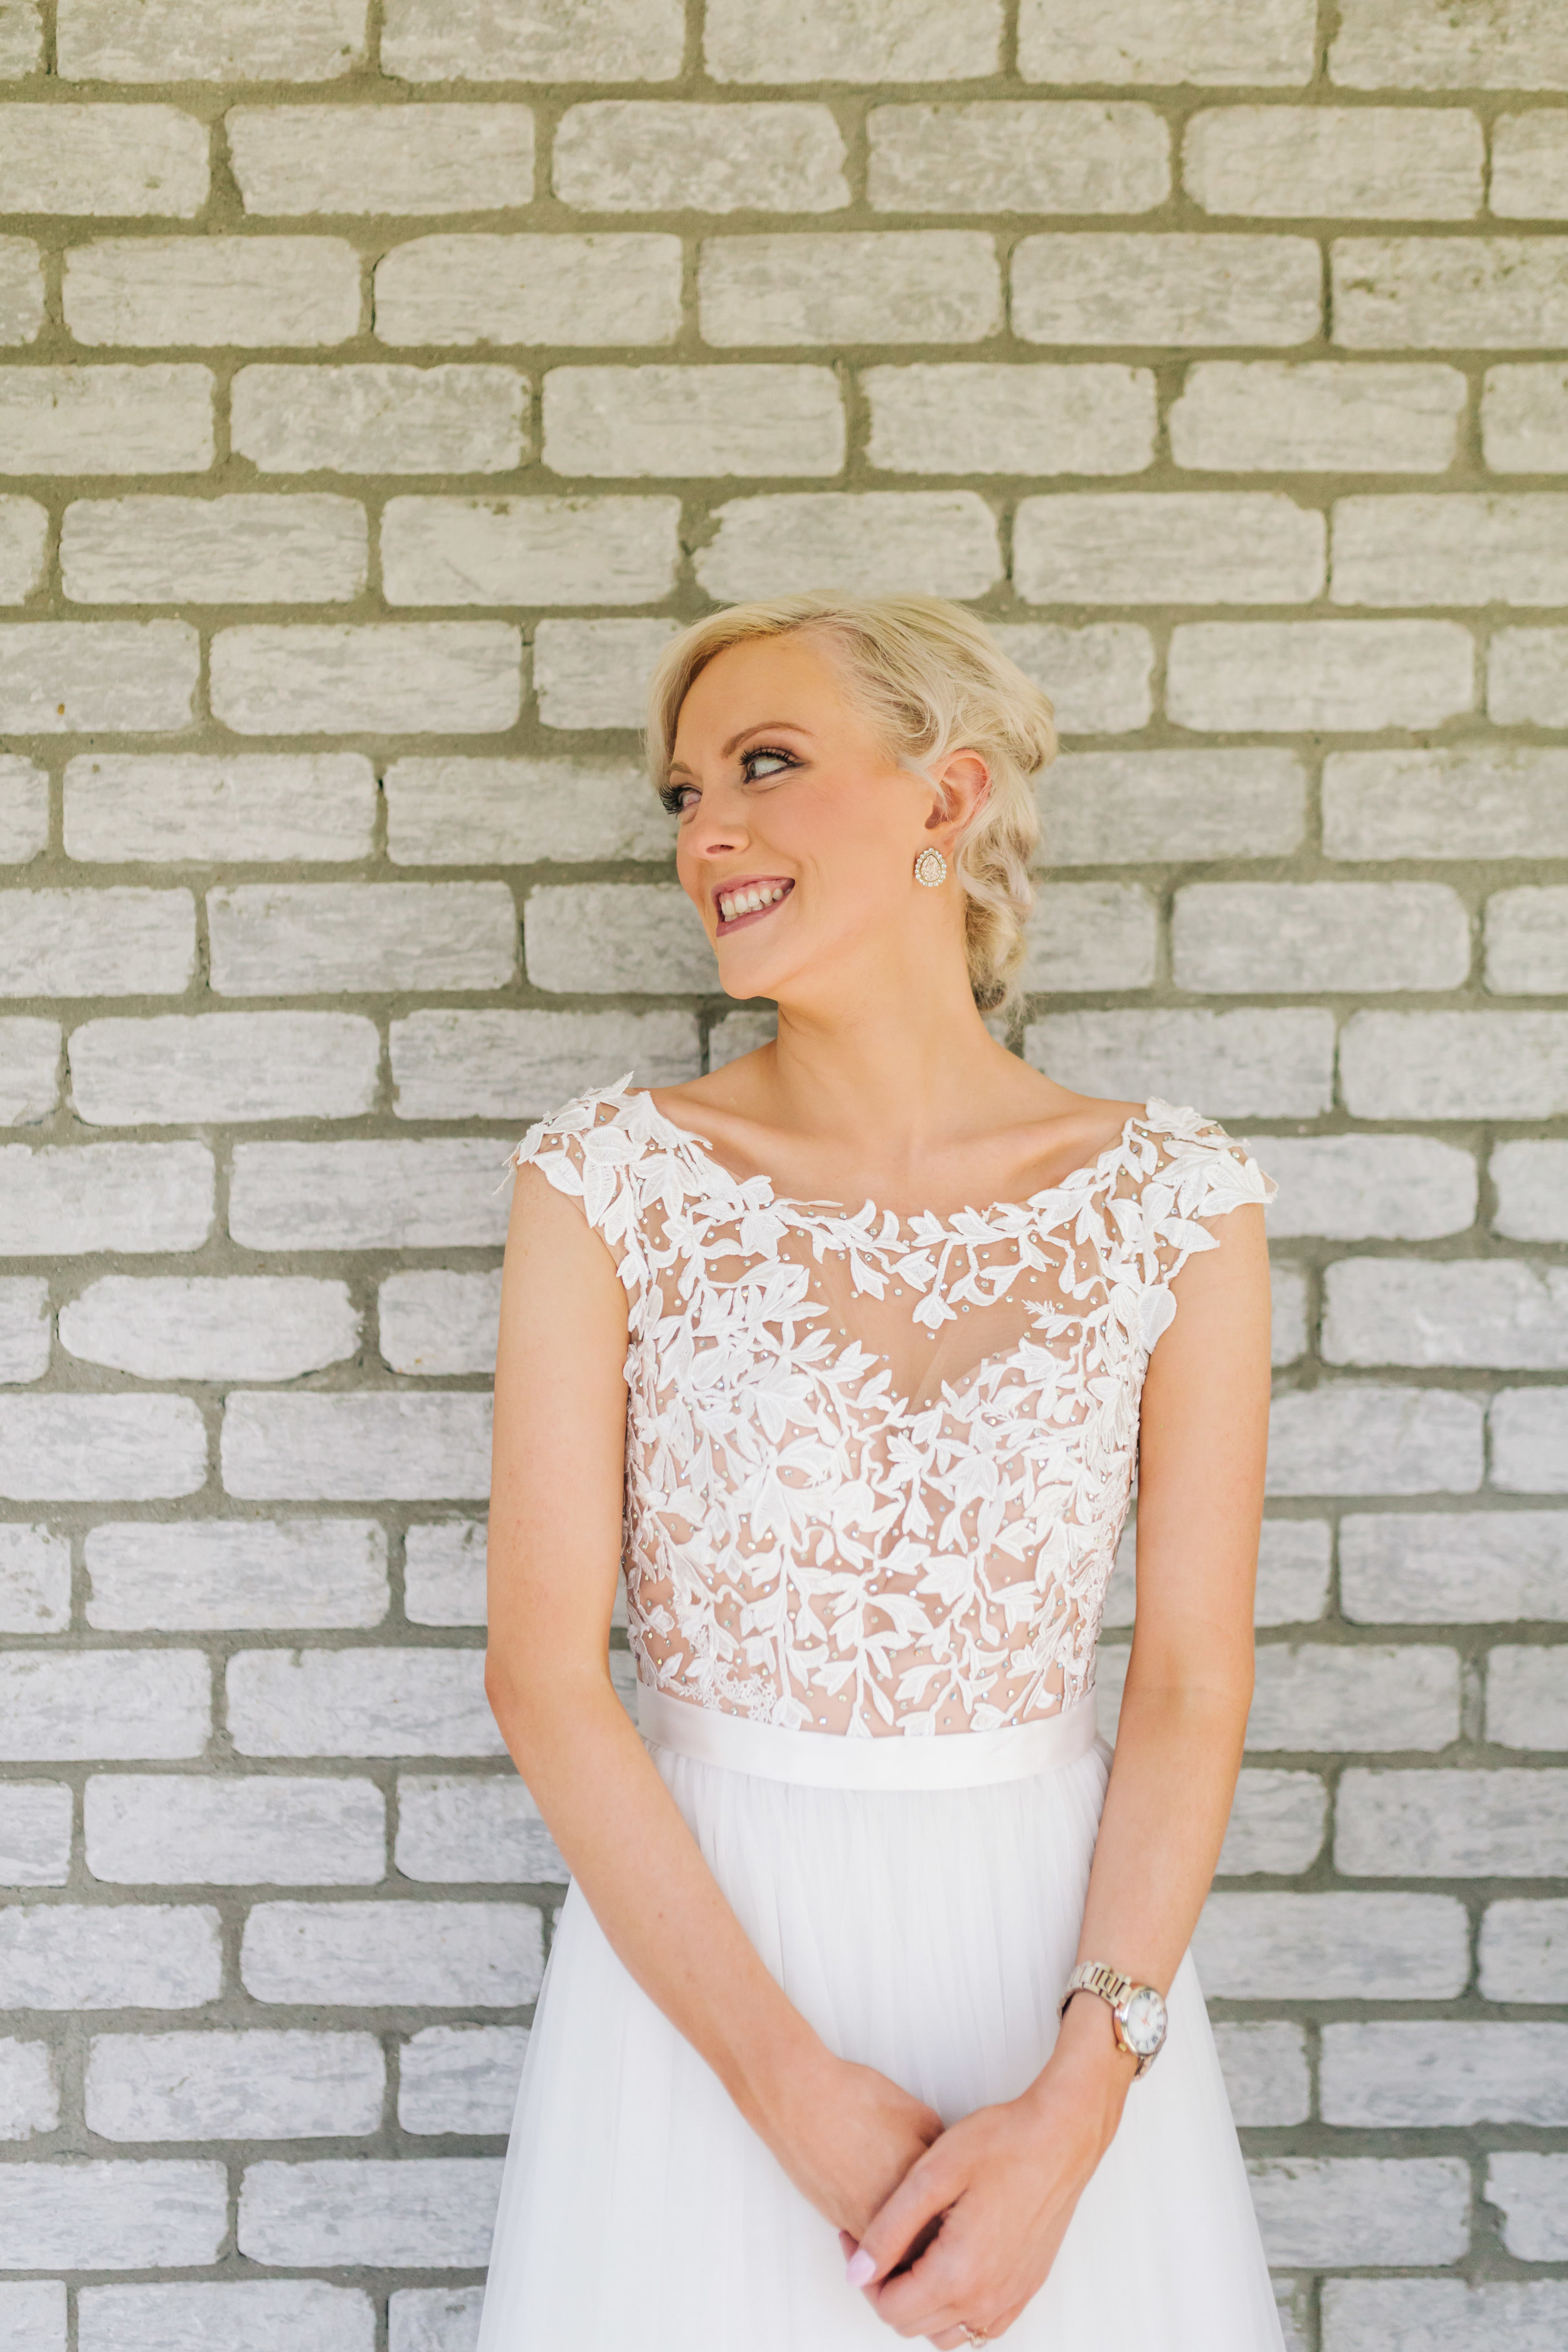 2018.09.02 Ray and Sarah Prizner Nashville TN Wedding FINALS-137.jpg